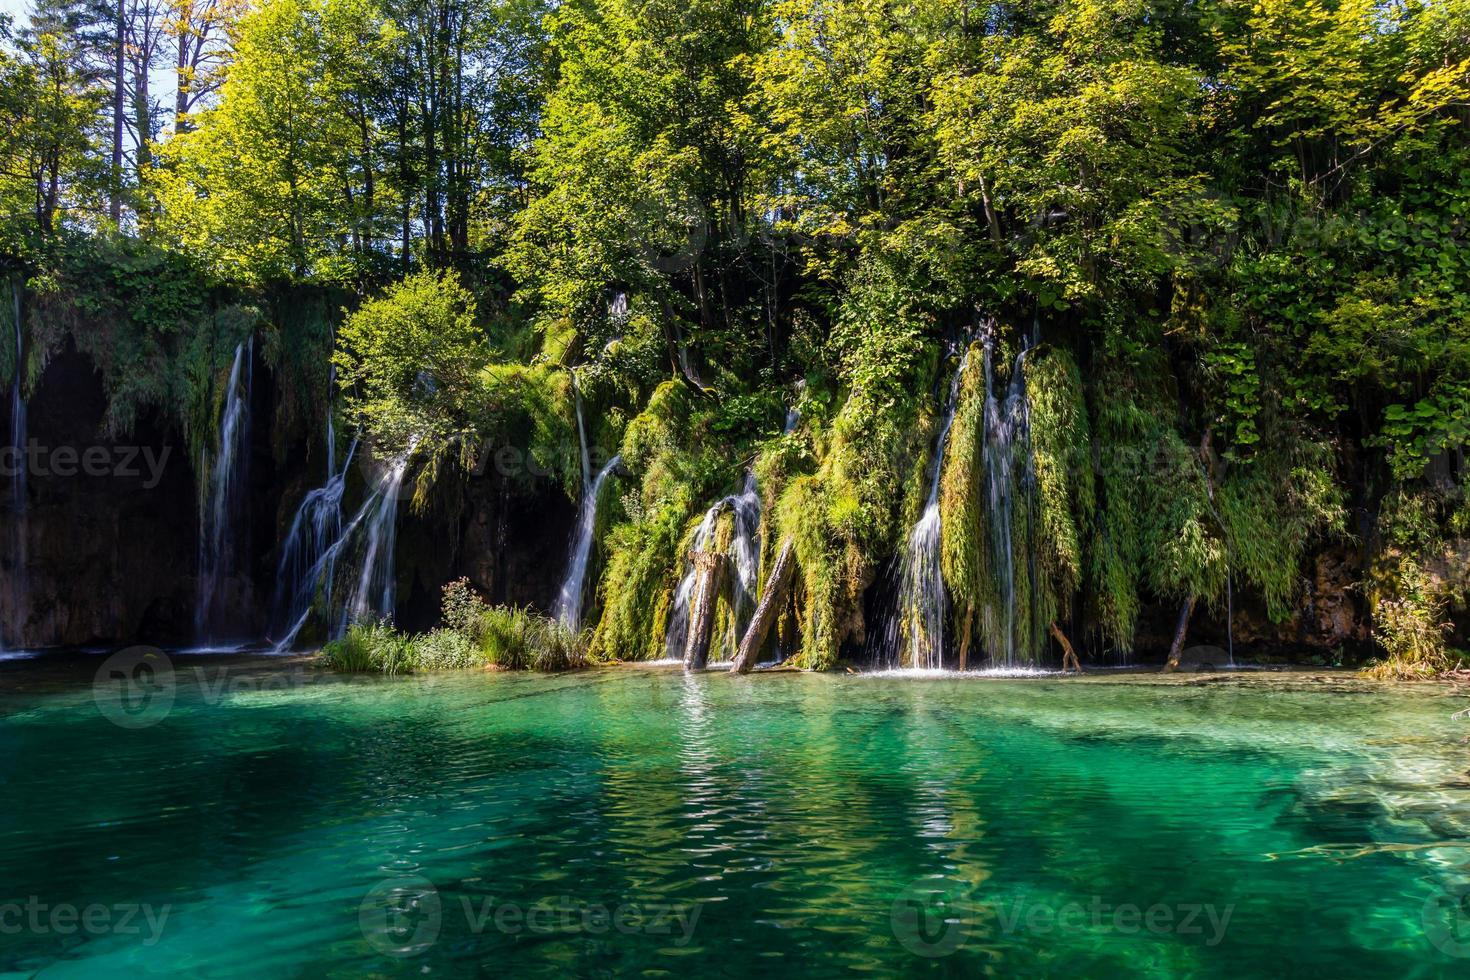 cachoeiras no parque nacional de plitvice, croácia foto